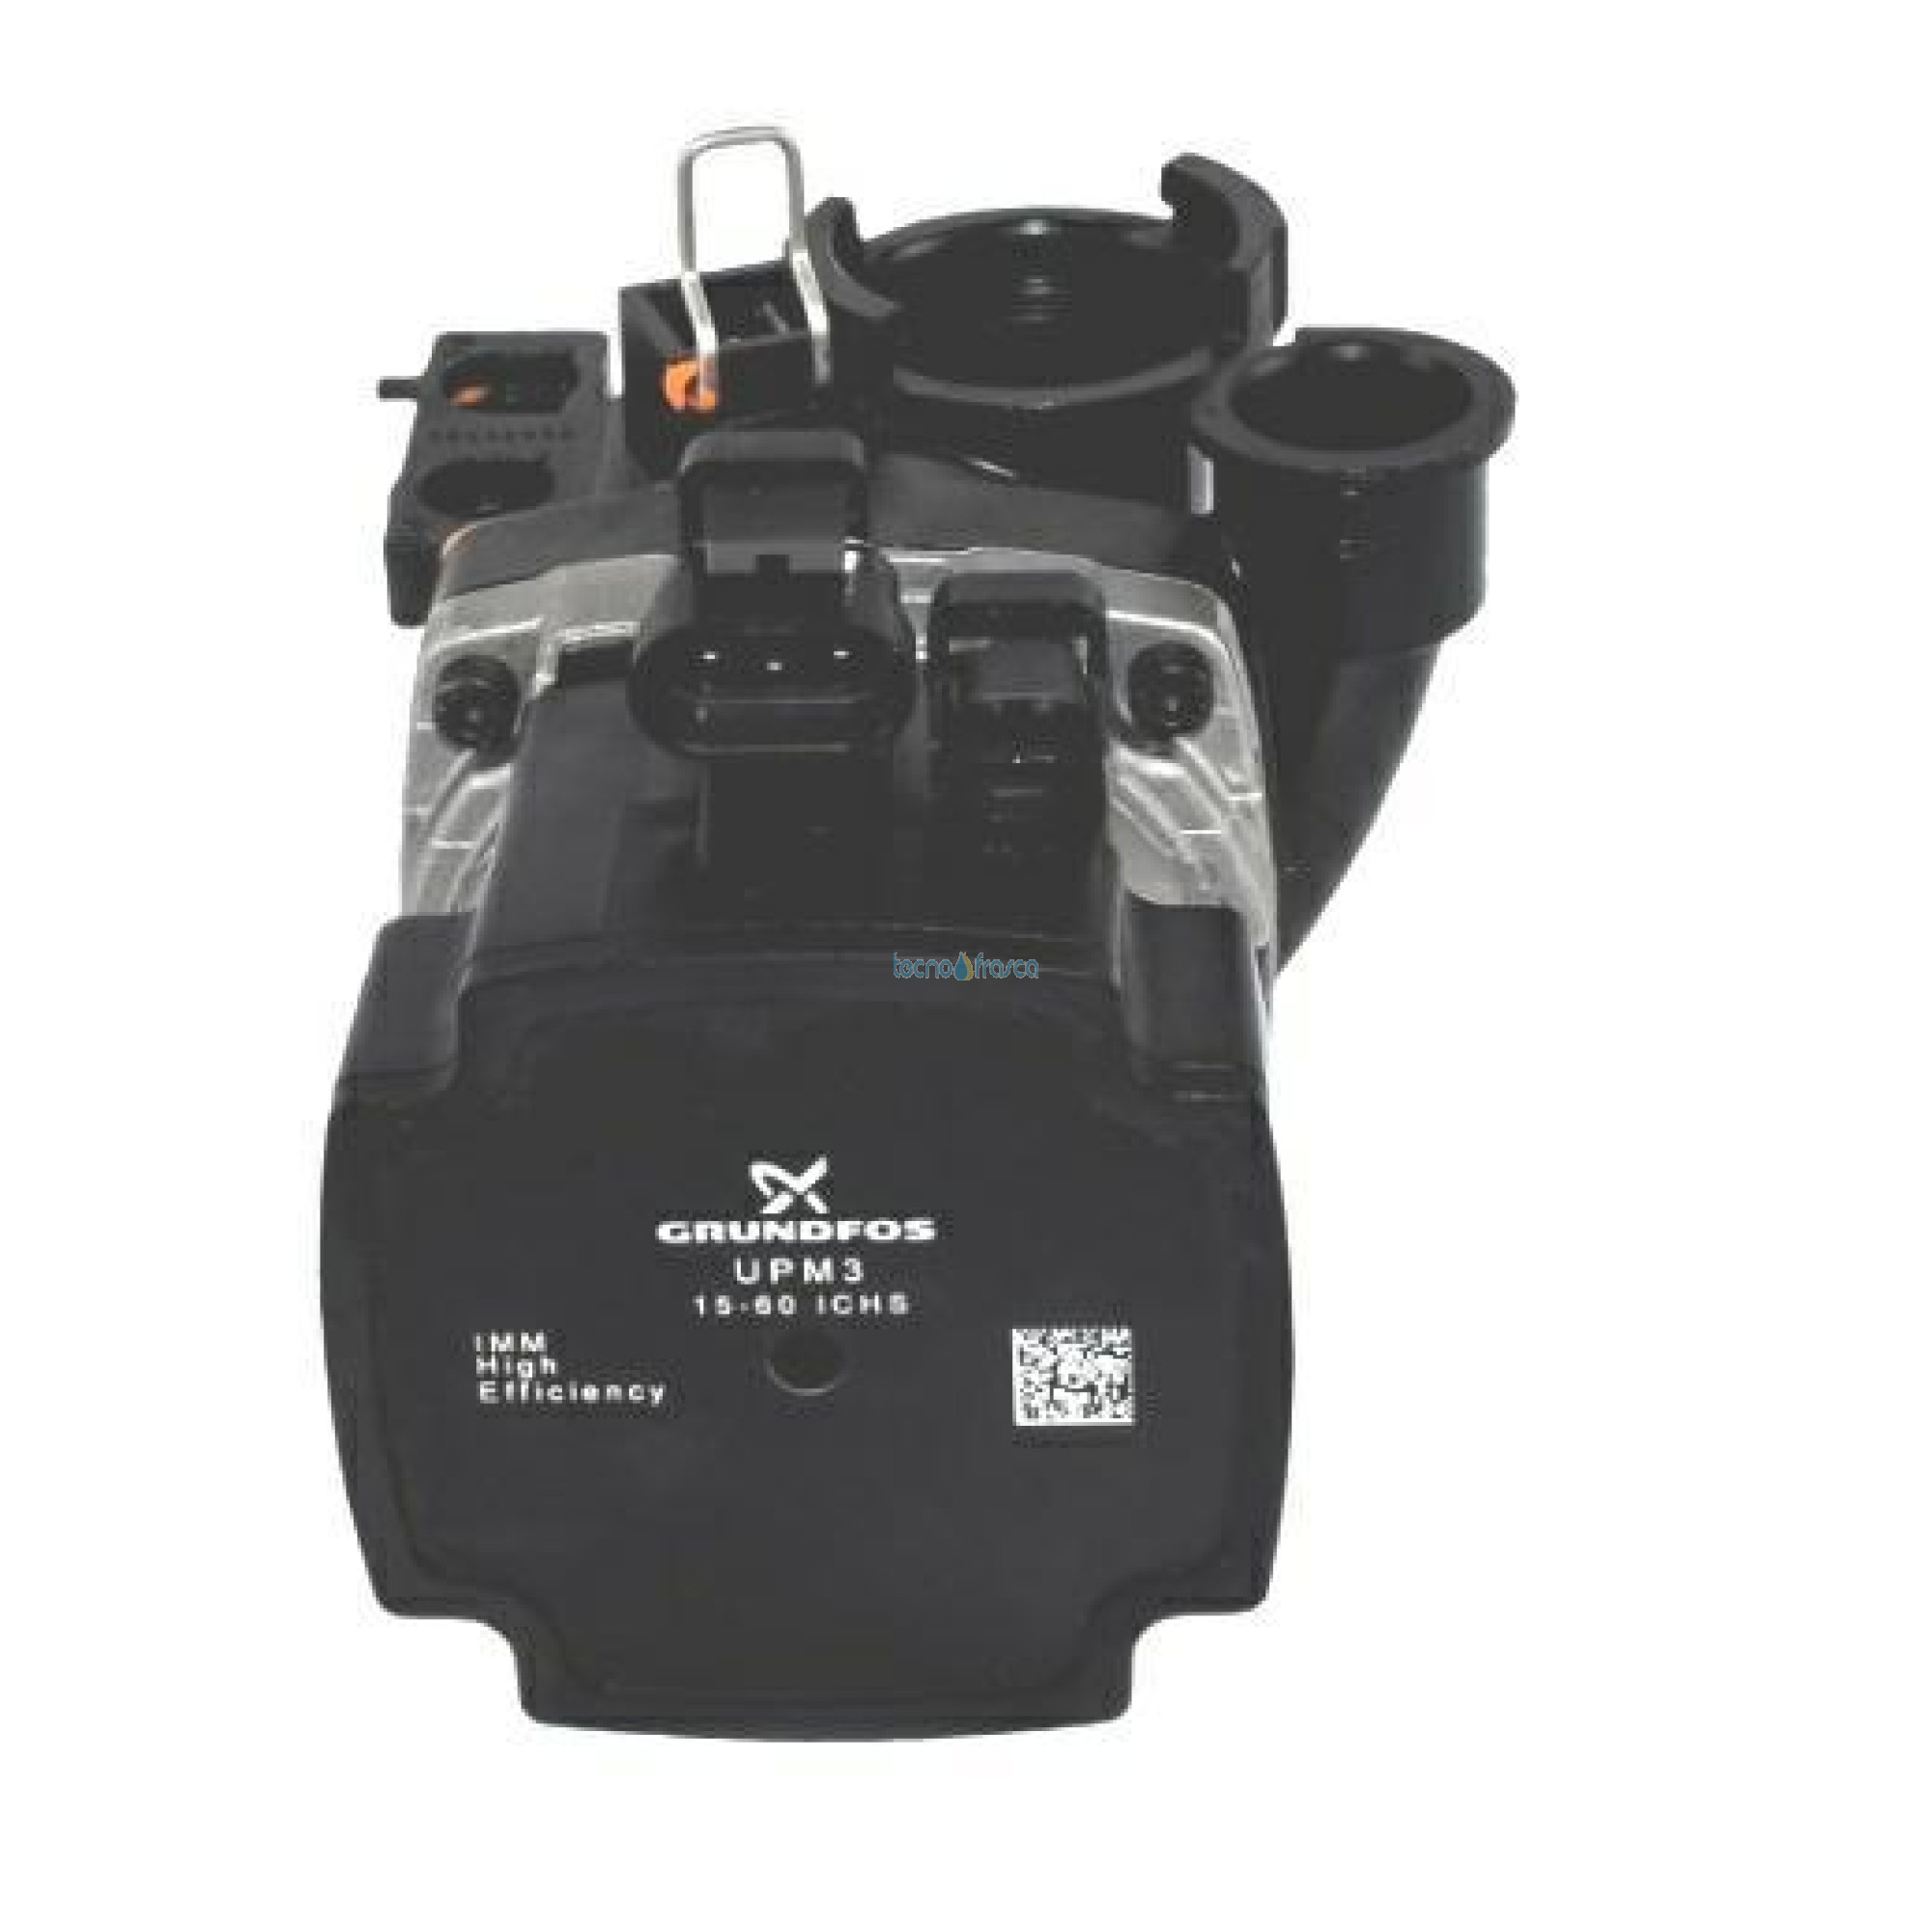 Pompa circolatore grundfos upm3 15-75 130 immergas 1.038162